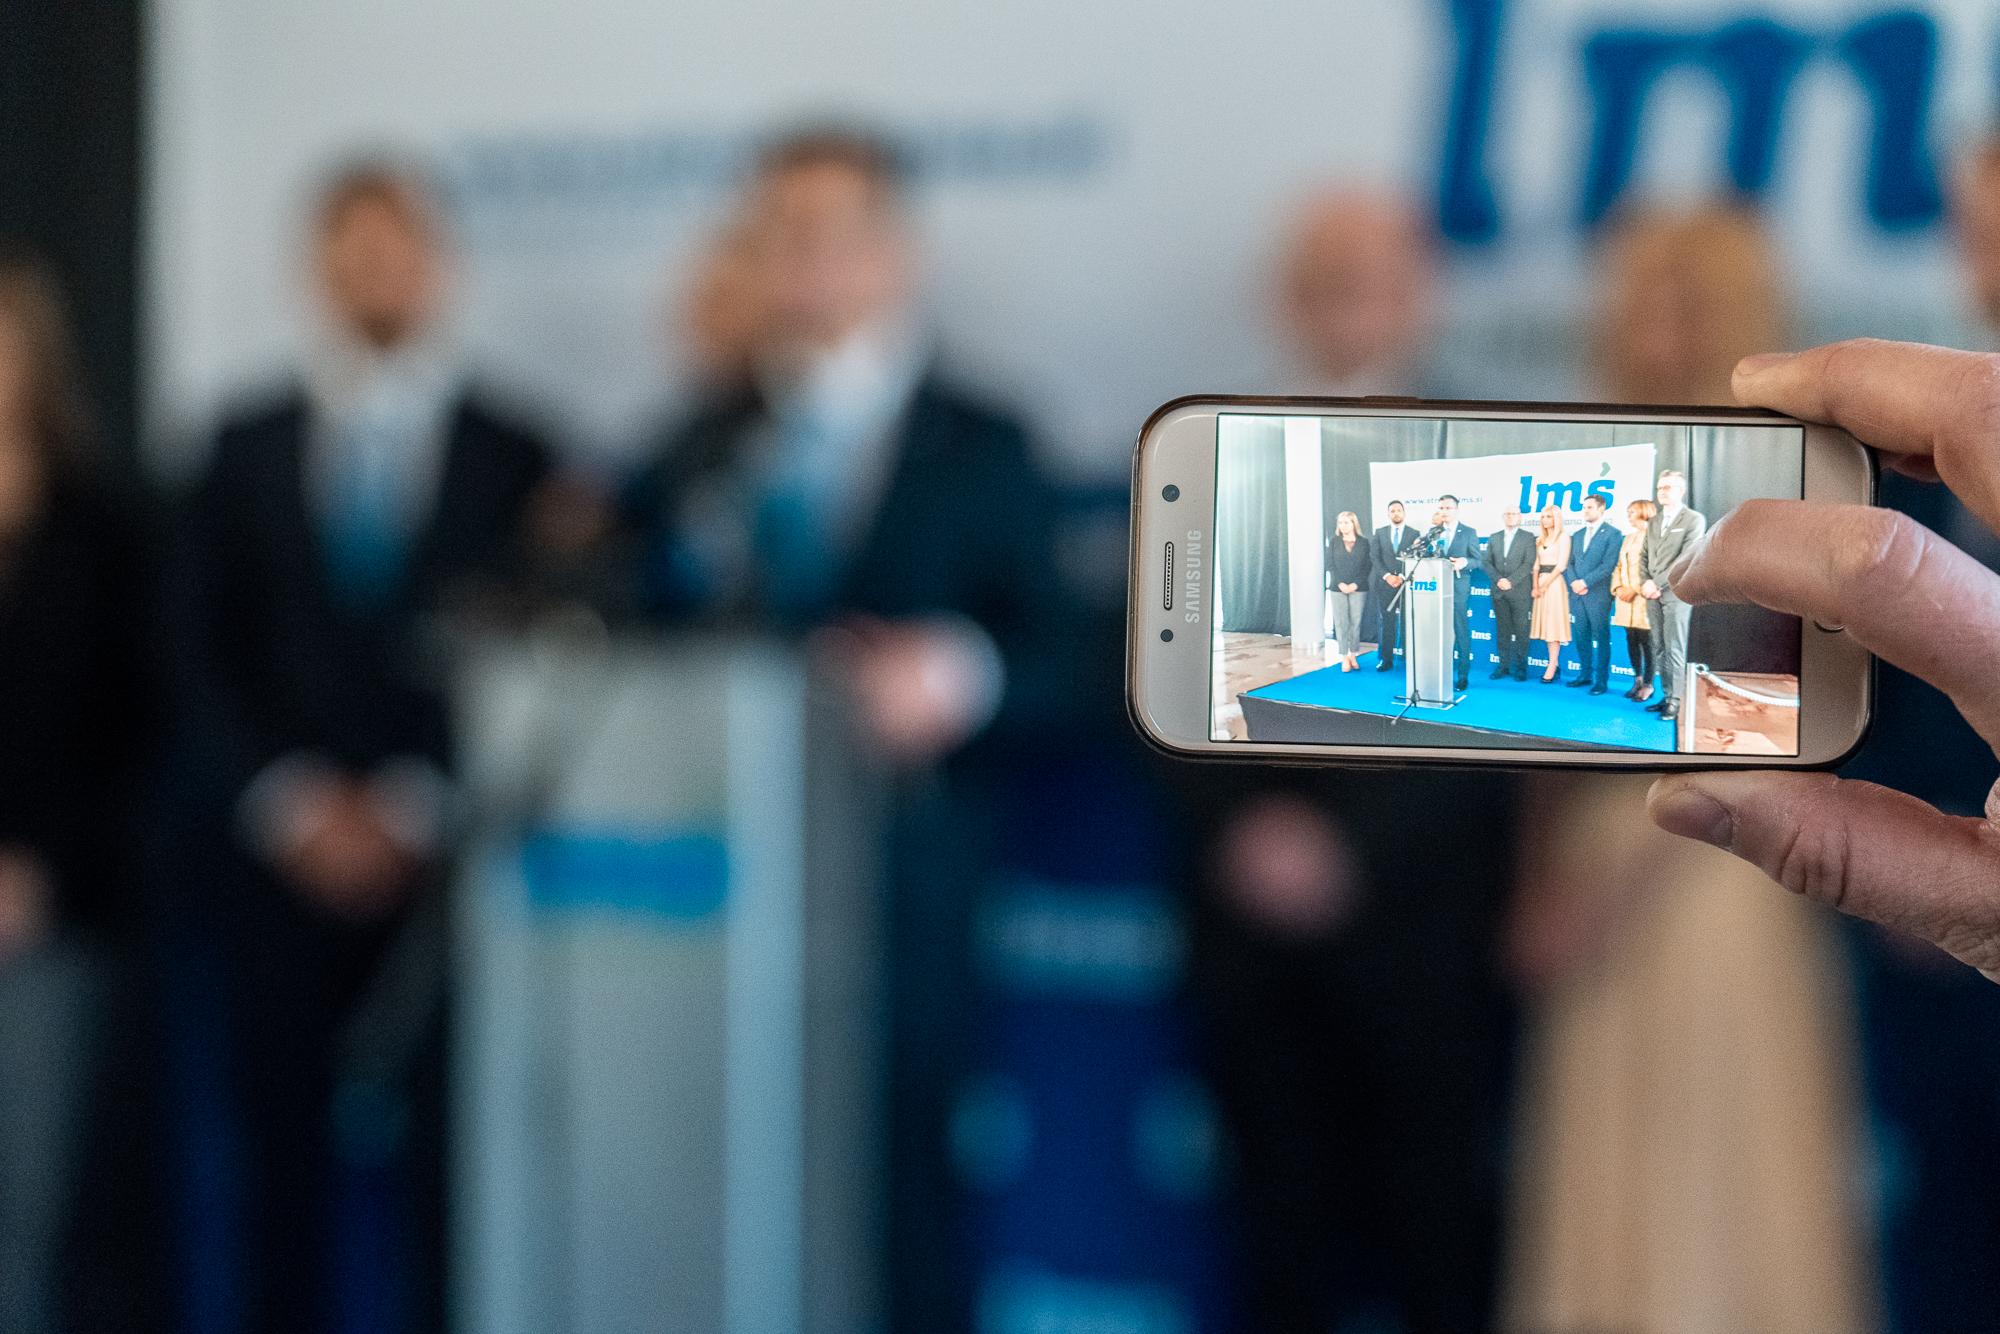 Marjan Šarec and the Candidates for the EU elections - Irena Joveva, dr. Klemen Grošelj, Edis Rujović, Tina Heferle, Jasna Ružicki, Luka Kočevar, dr. Justina Erčulj and Rudi Spruk - on the stage of the Fifth Congress of Lista Marjana Šarca in Trbovlje the stage of the Fifth Congress of Lista Marjana Šarca in Trbovlje